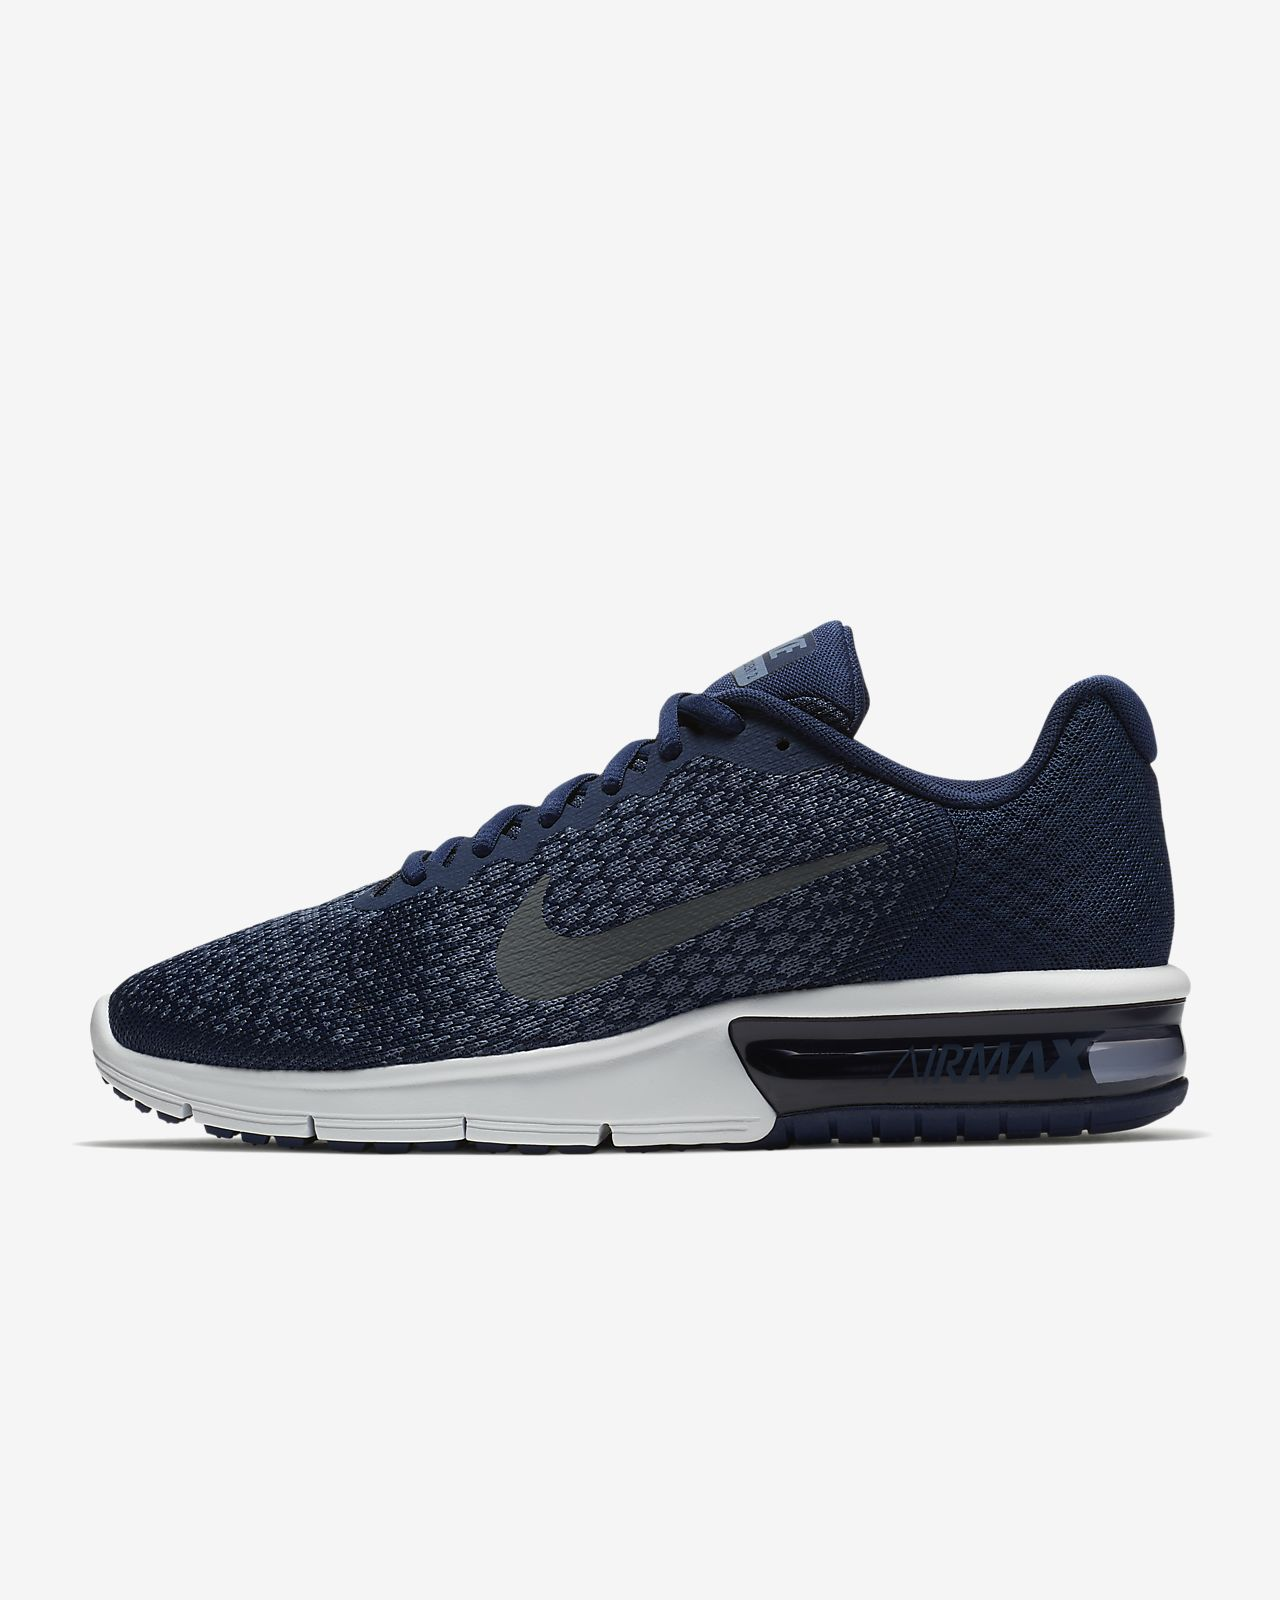 best website 27aa4 2f6a1 ... Nike Air Max Sequent 2 herresko